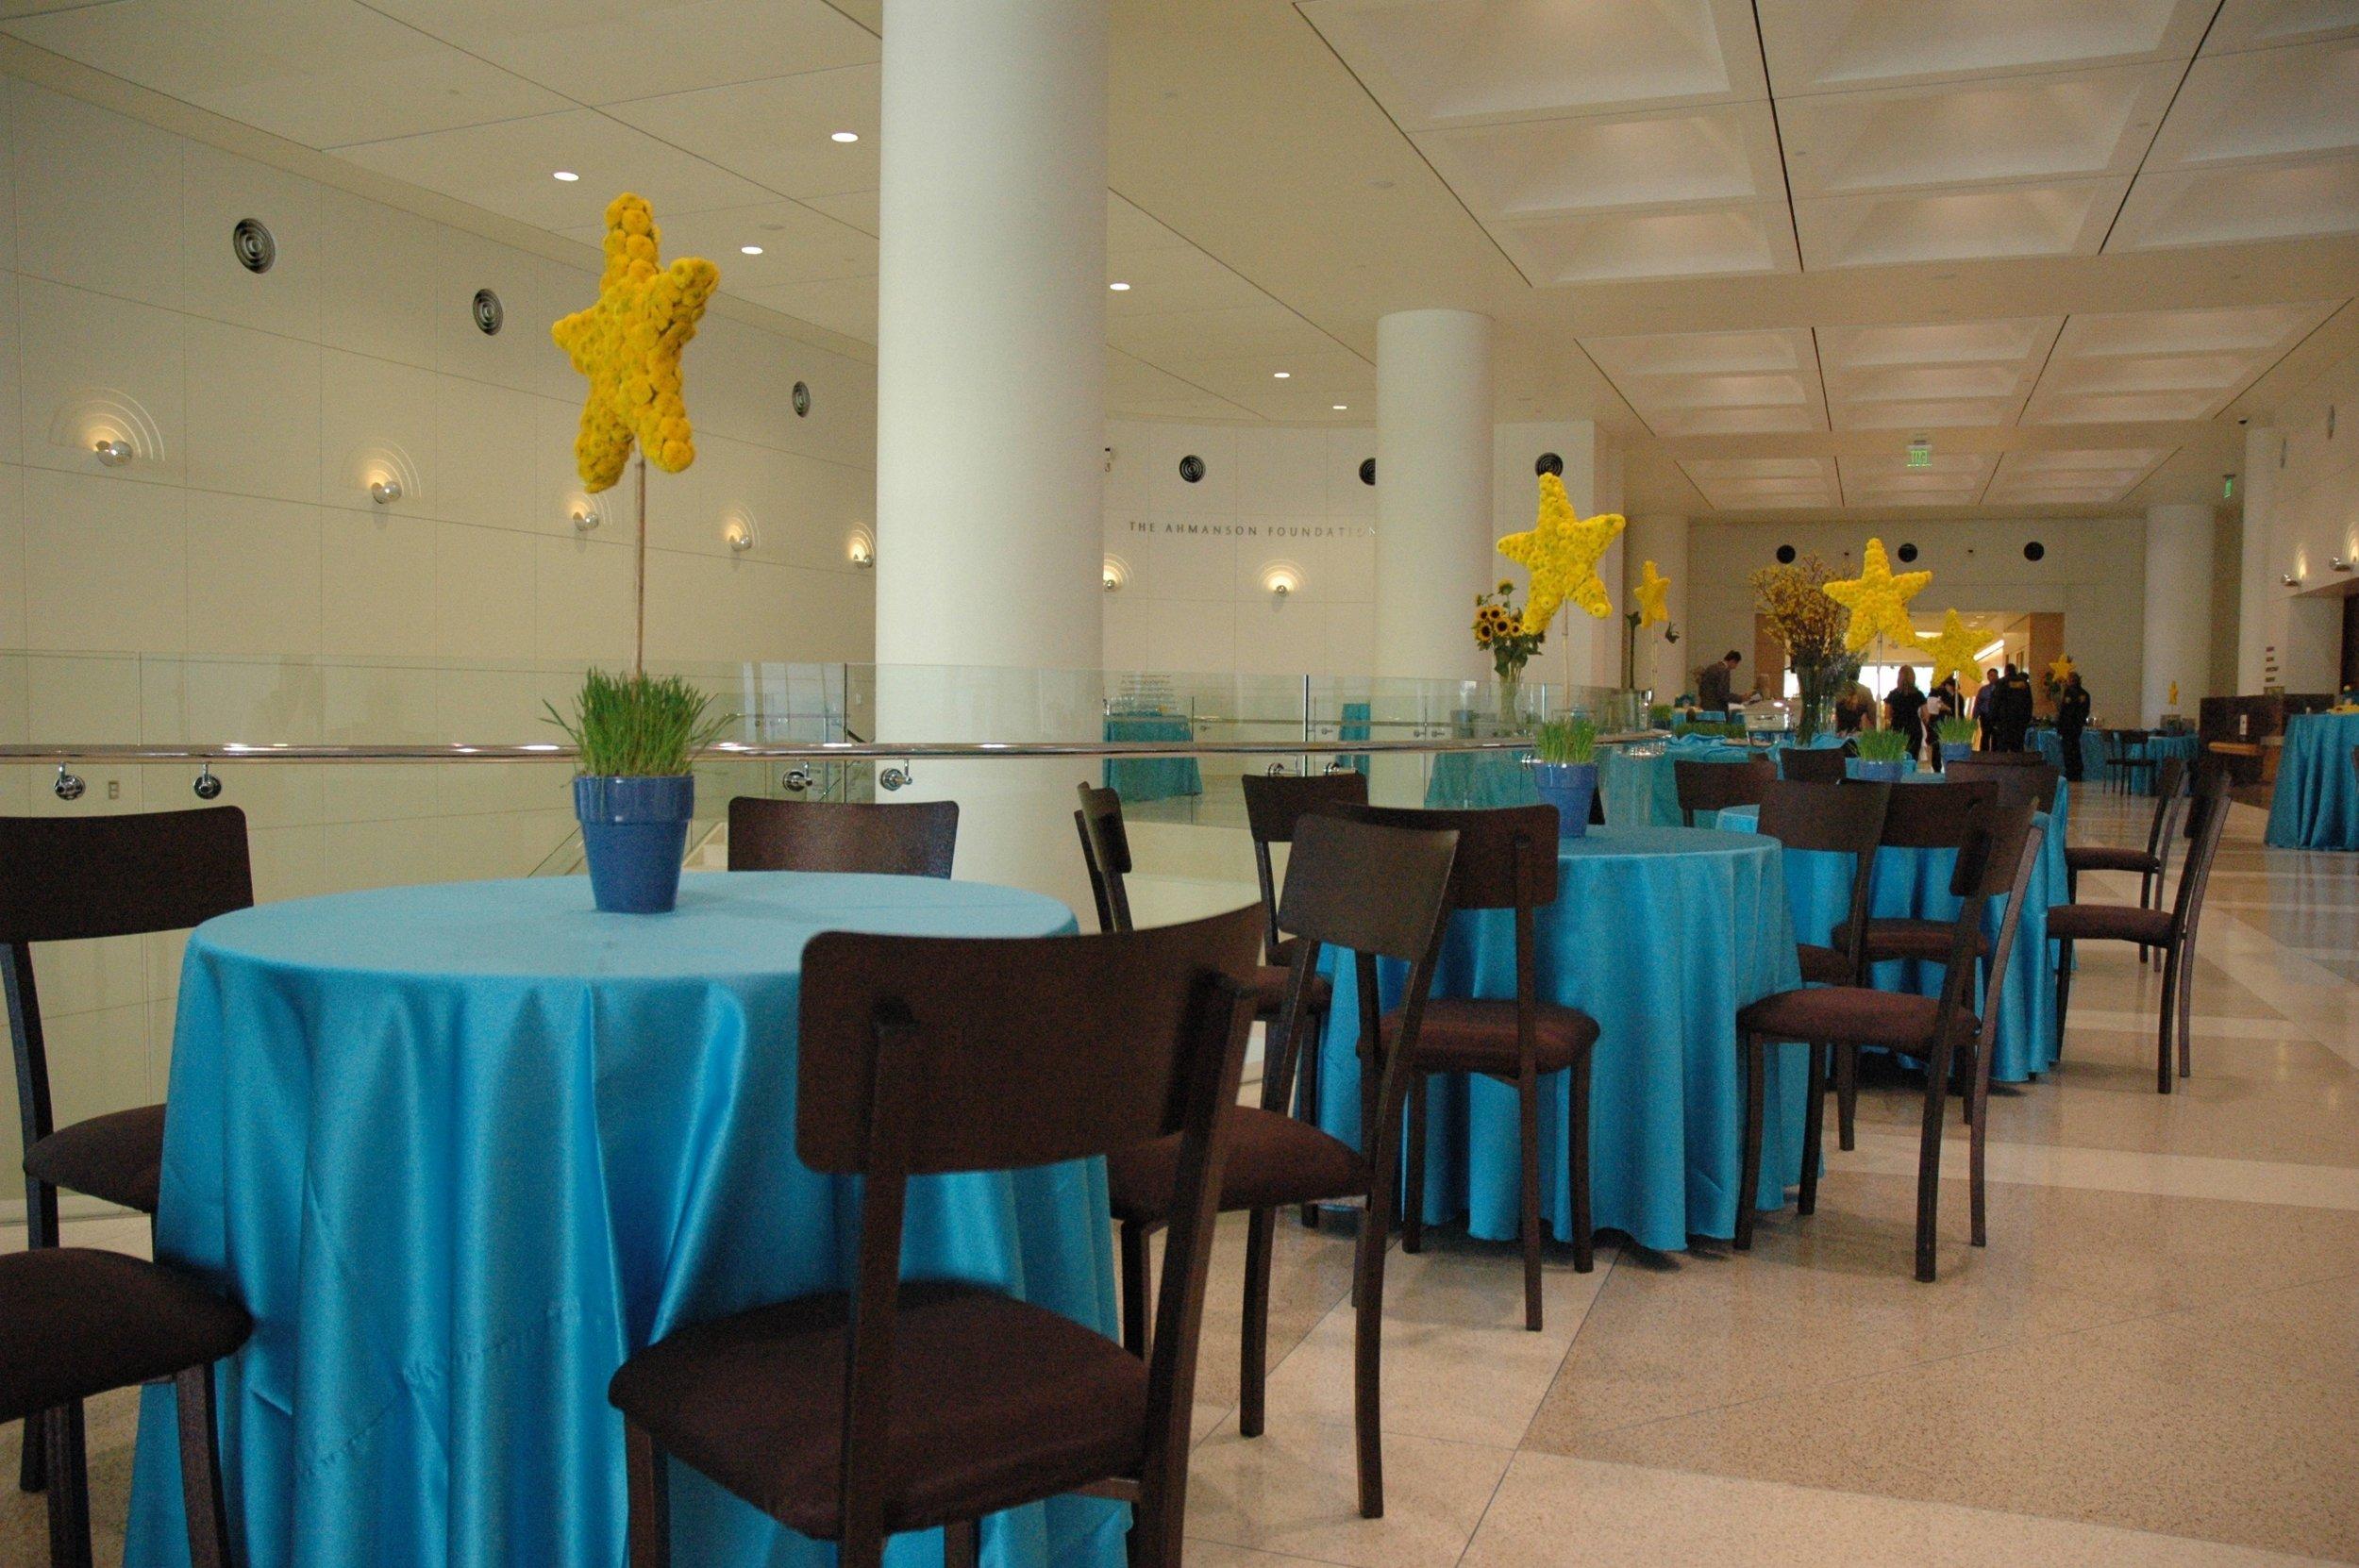 Mattel Children's Hospital Grand Opening Event